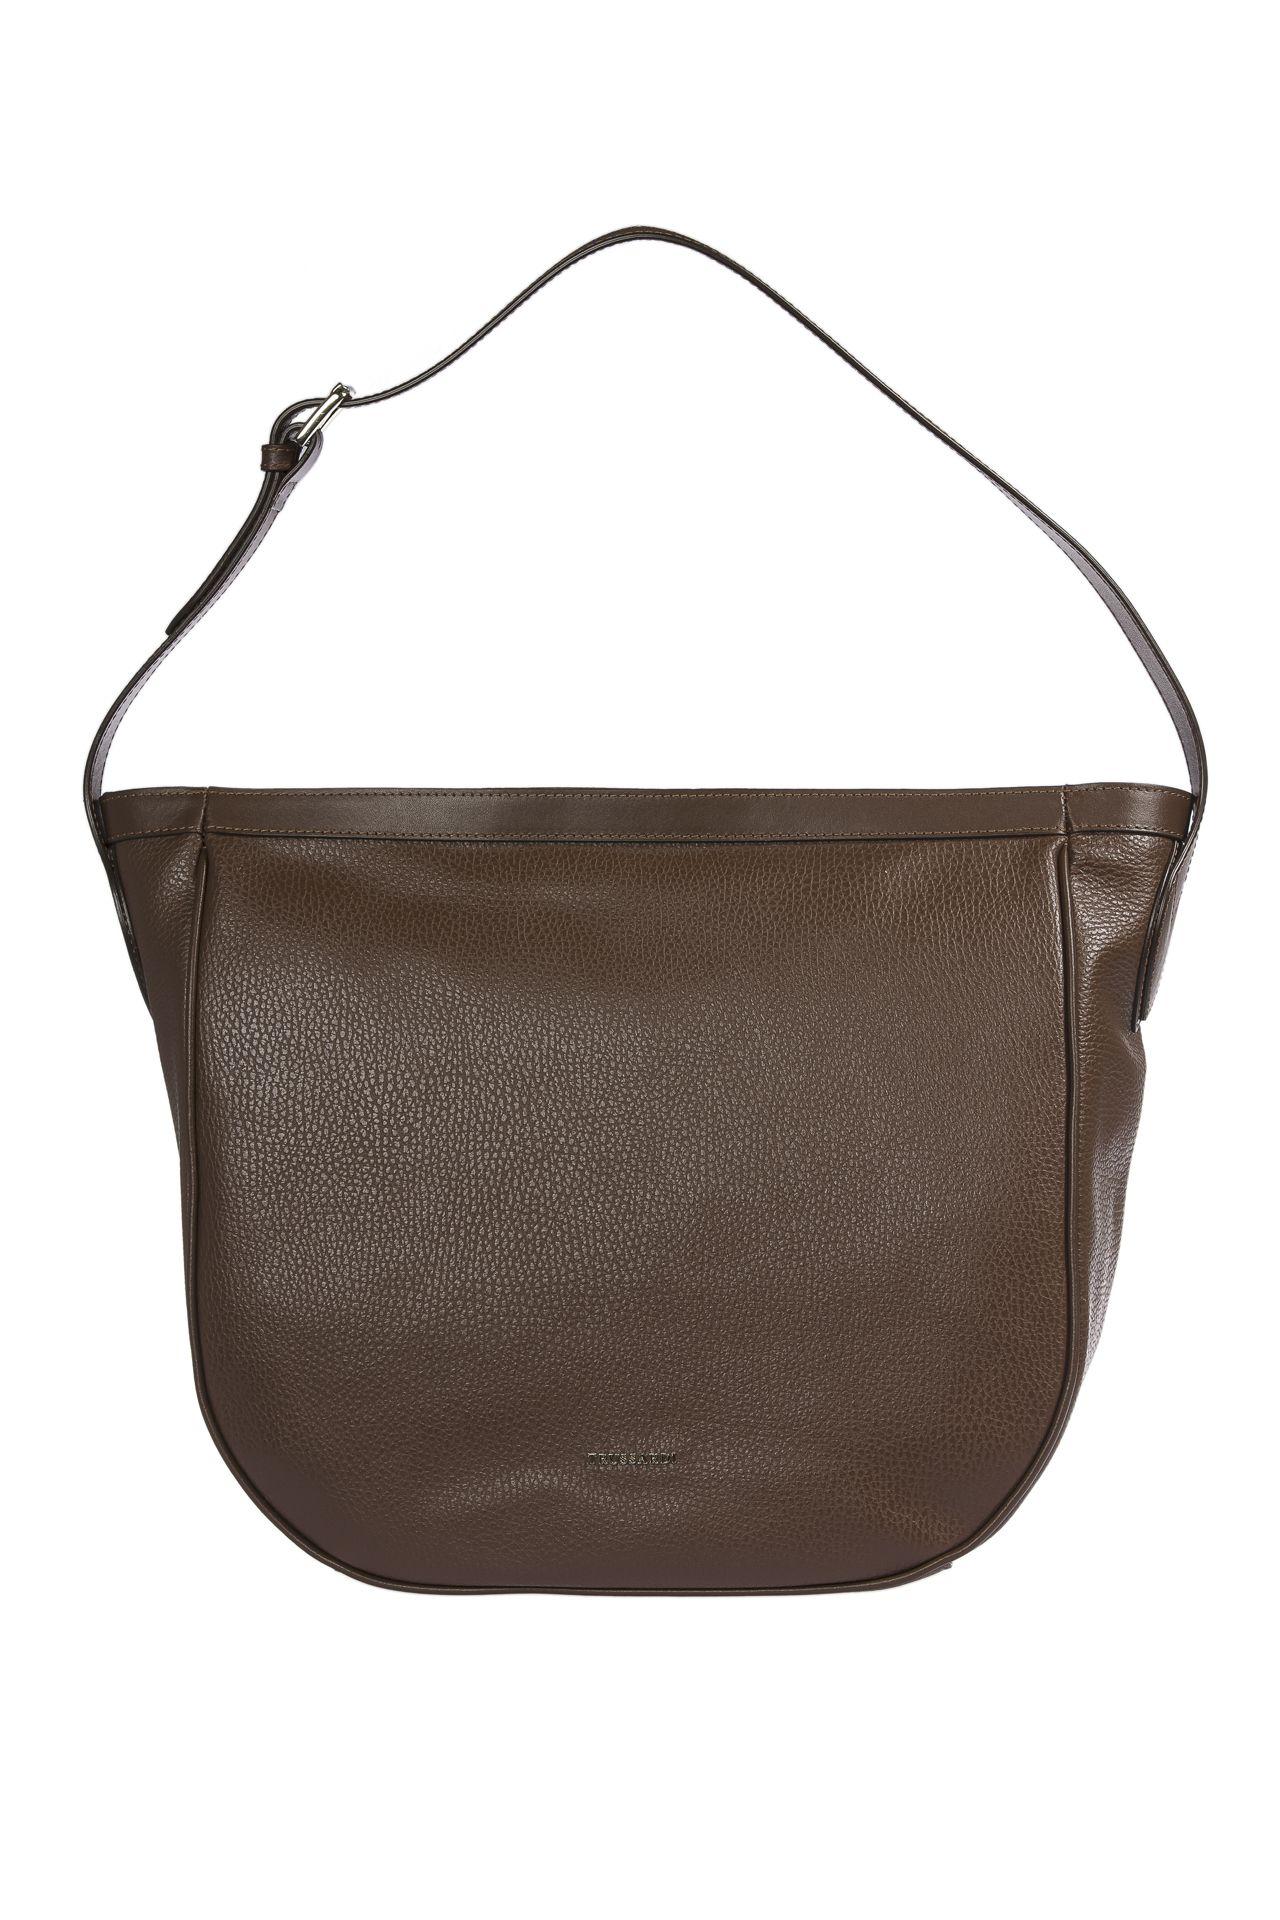 Trussardi Women's Shoulder Bag Brown 1DB517_69DarkBrown